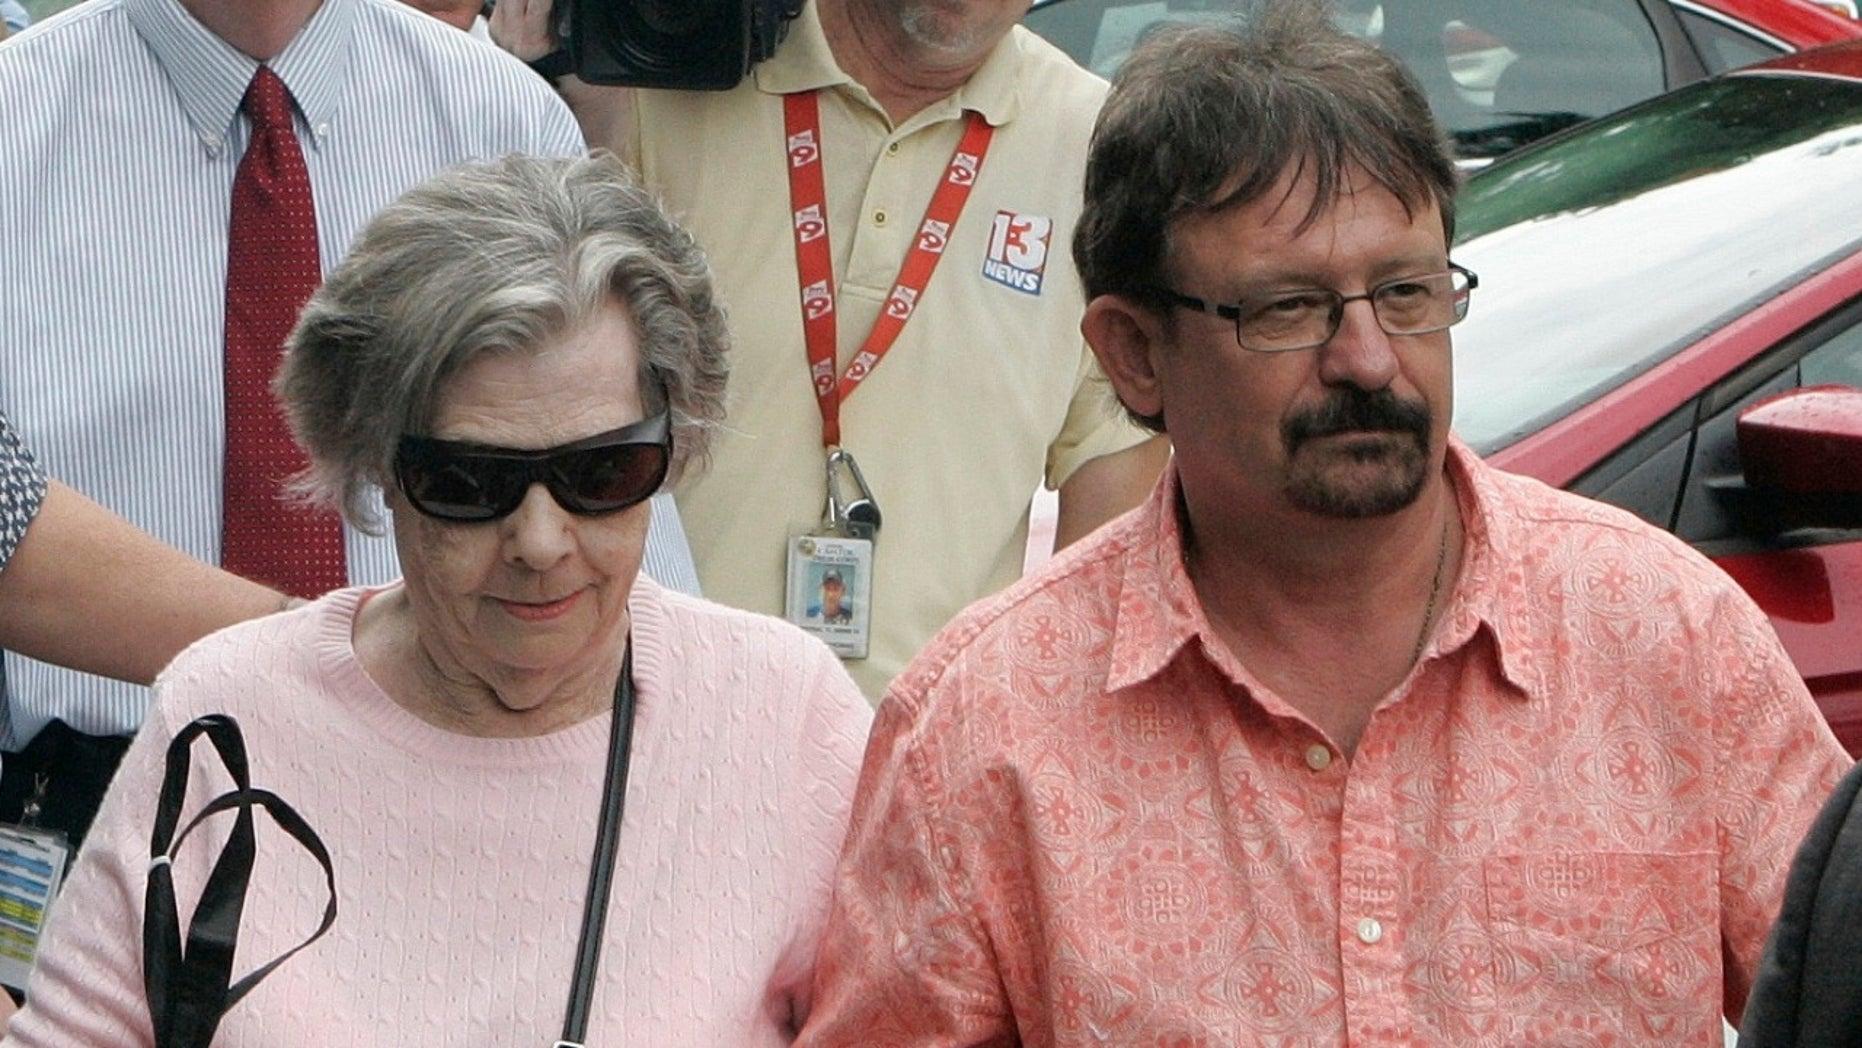 Zephyrhills Powerball victor, 90, sues son over money mismanagement